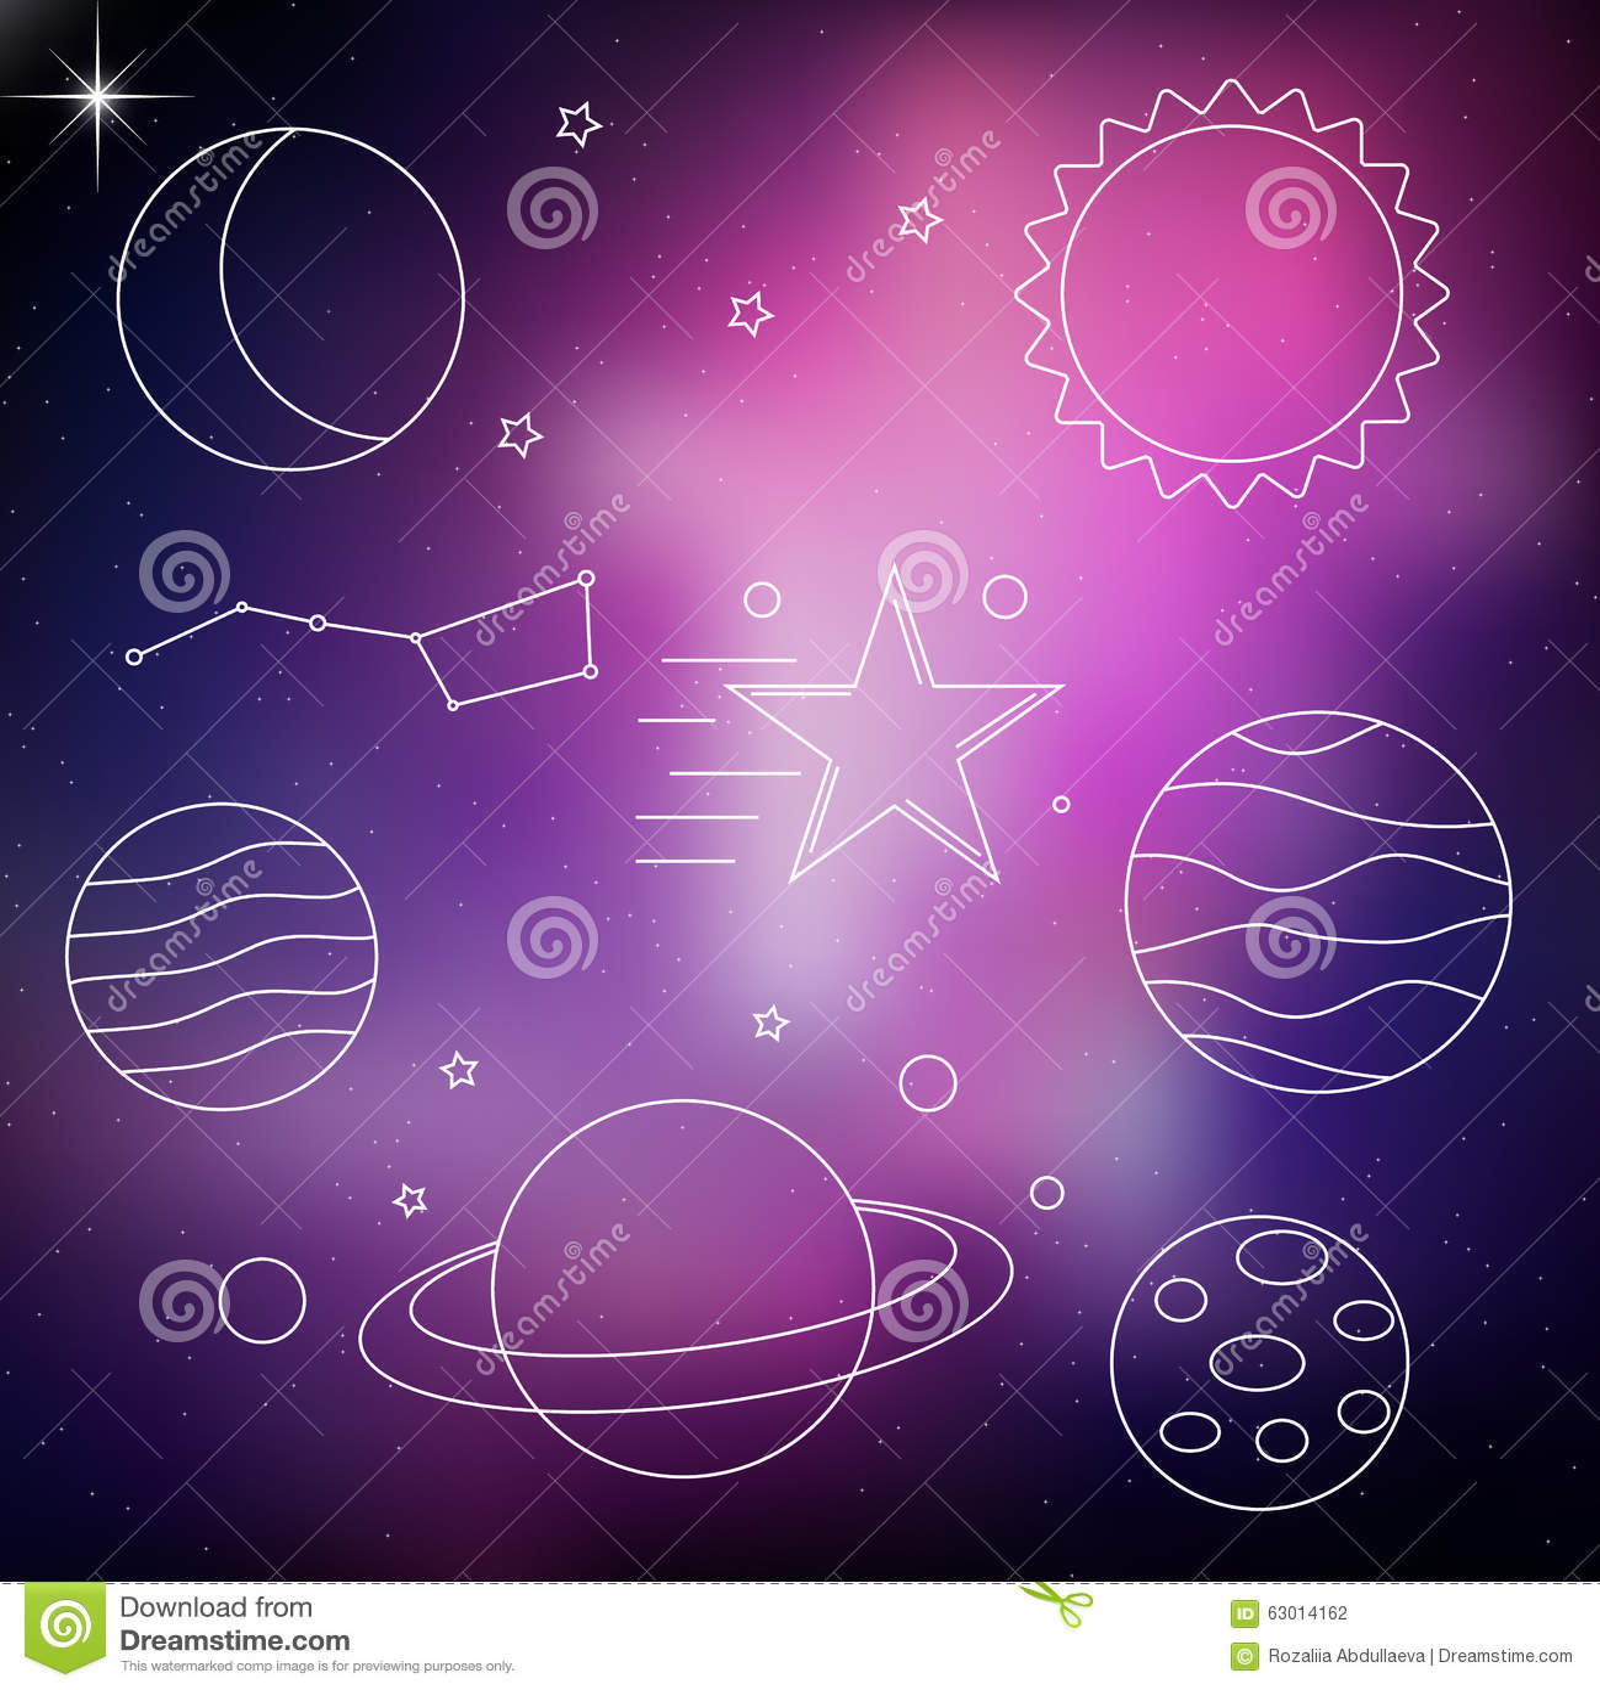 purple planet star comet - photo #20